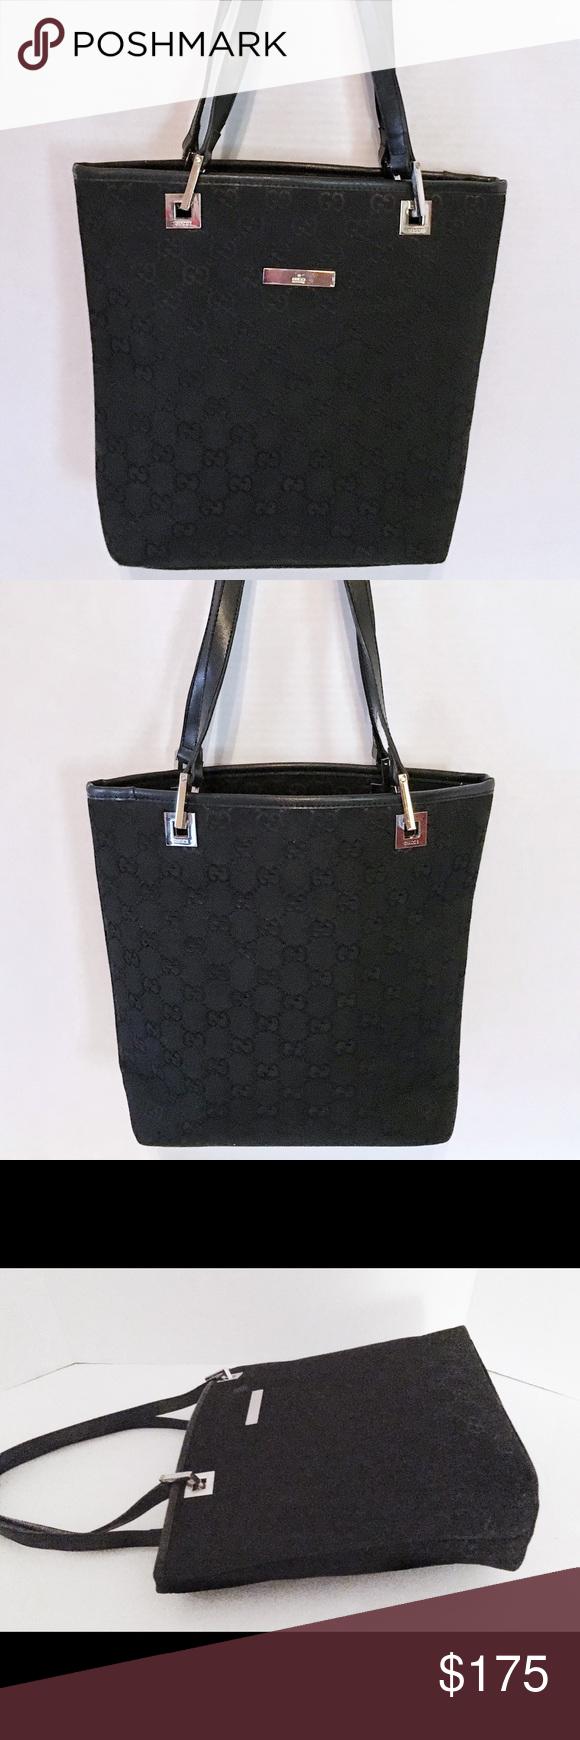 928293c1f2 GUCCI Auth Black Monogram Jacquard Tote Handbag Authentic GUCCI GG monogram  small tote handbag. Very